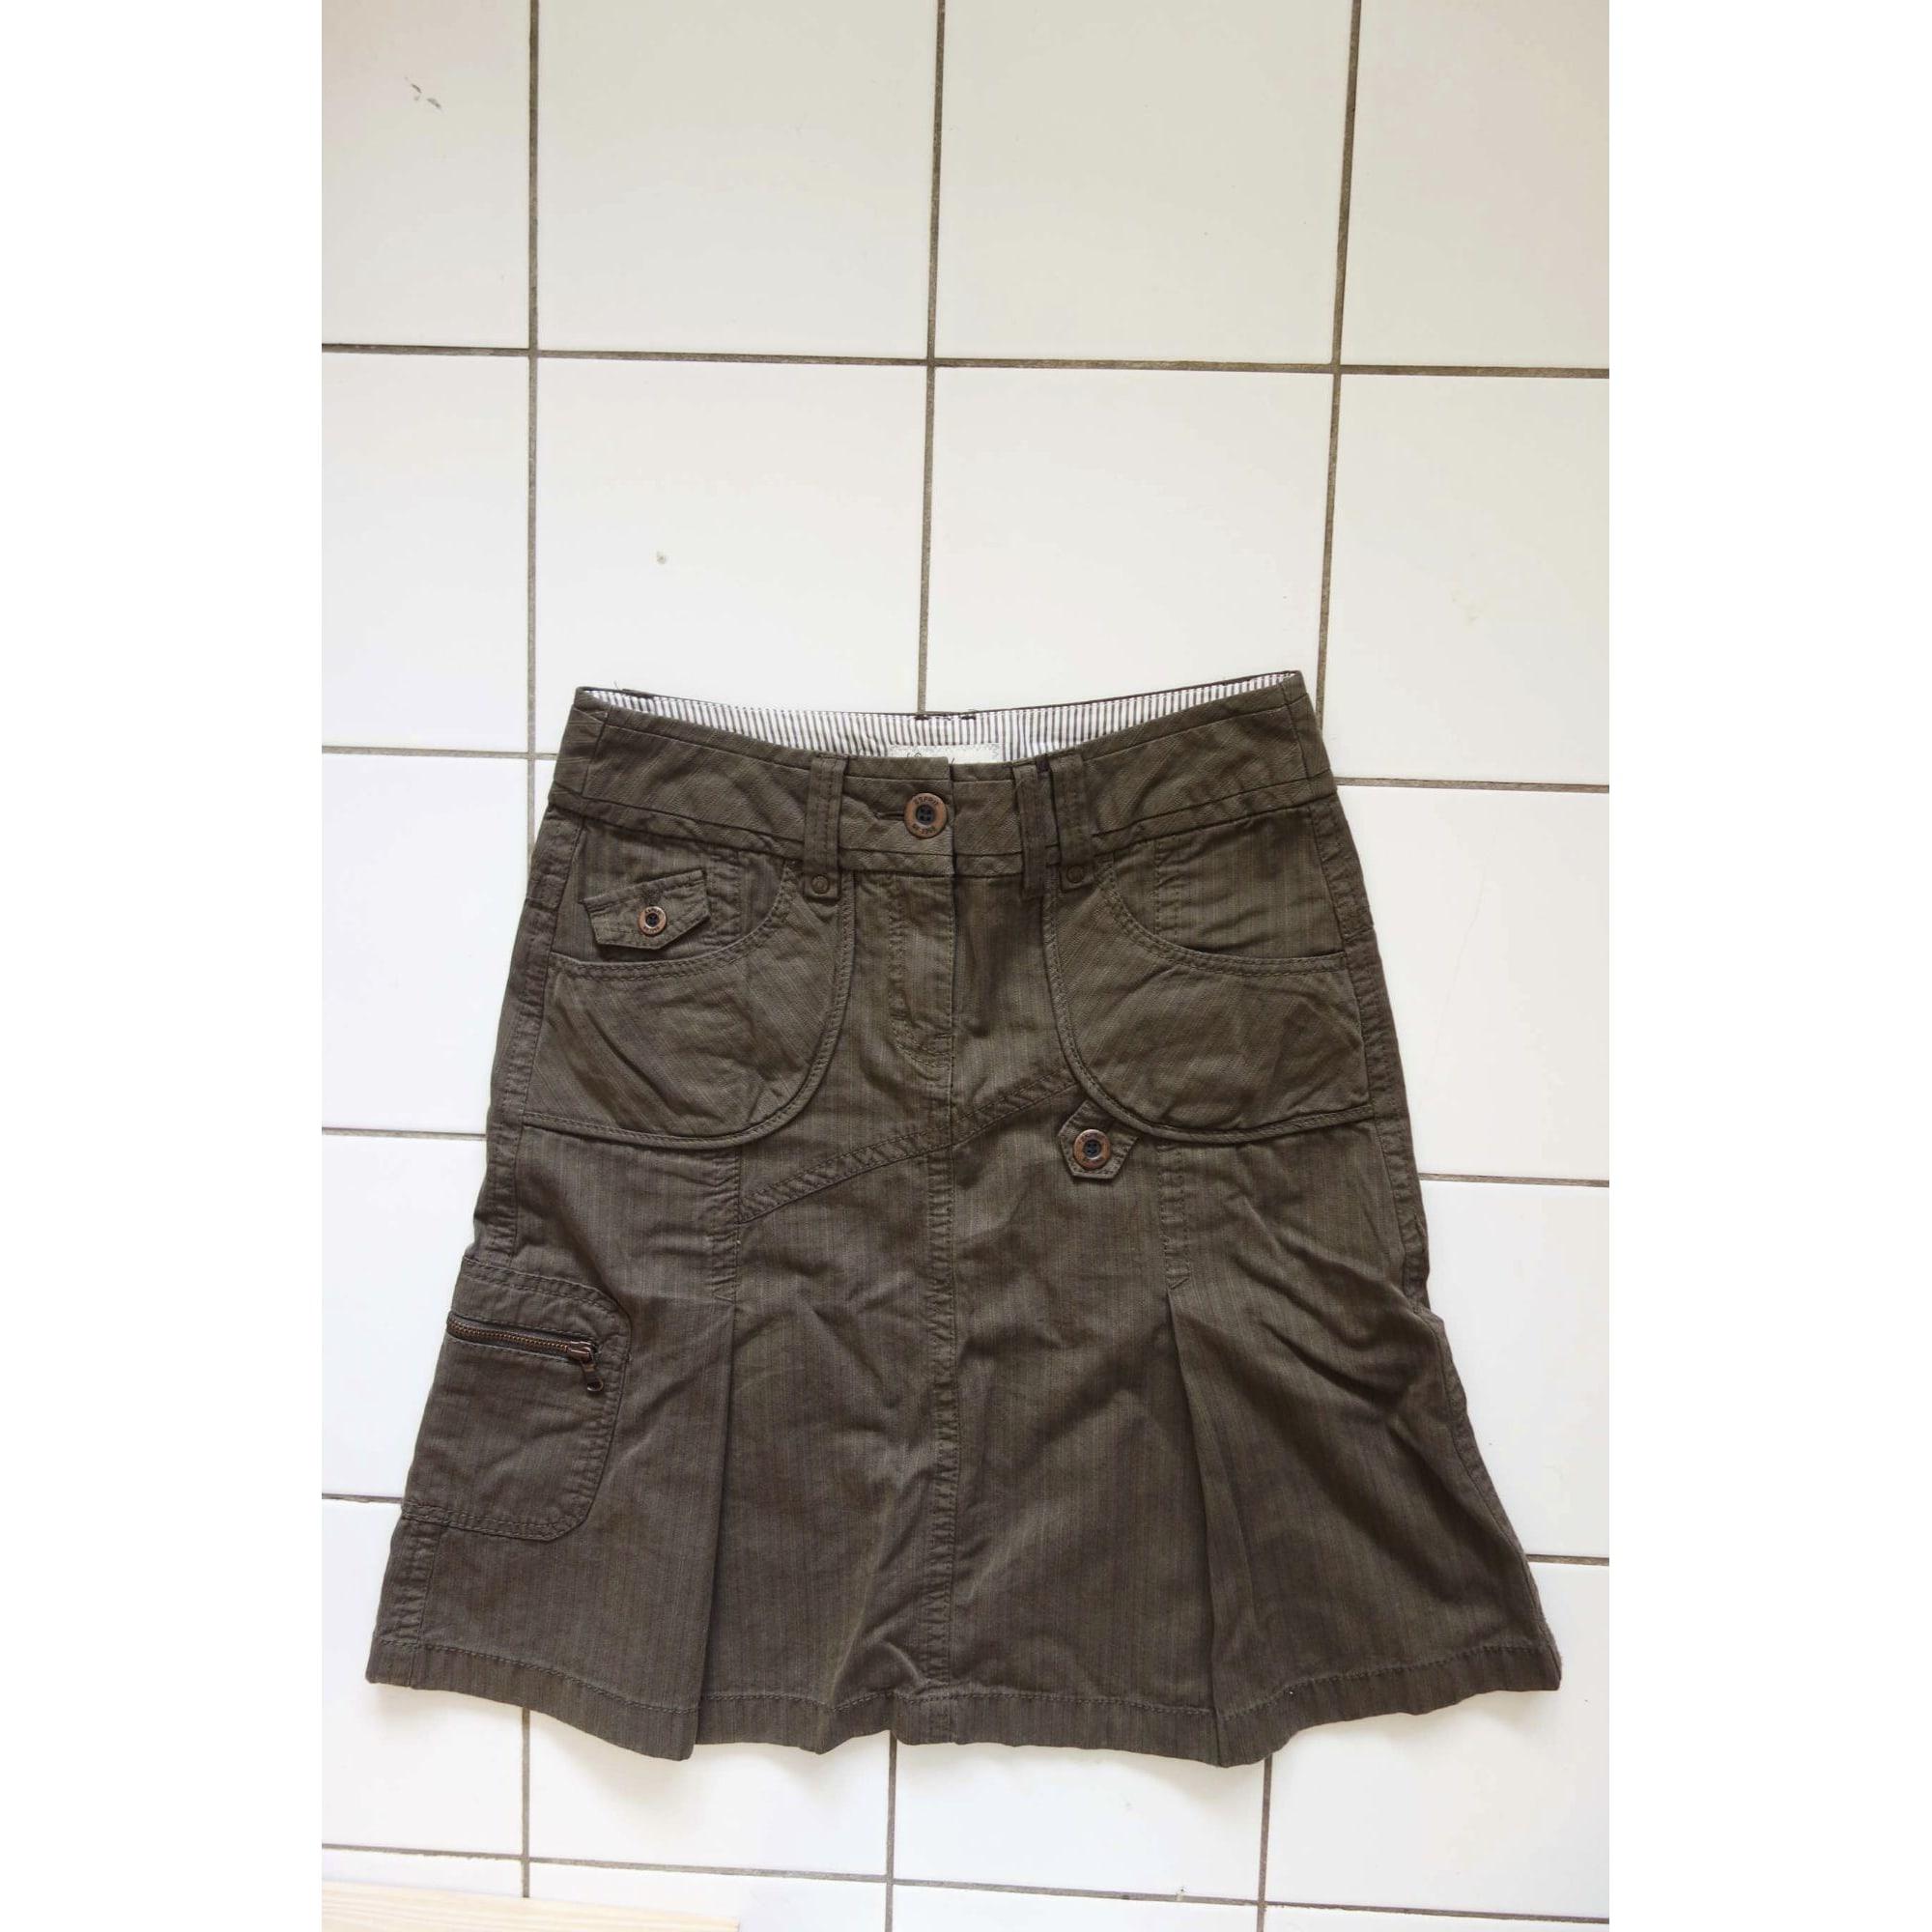 515c3029c9 Denim Skirt ESPRIT DE.CORP 38 (M, T2) brown - 7873370